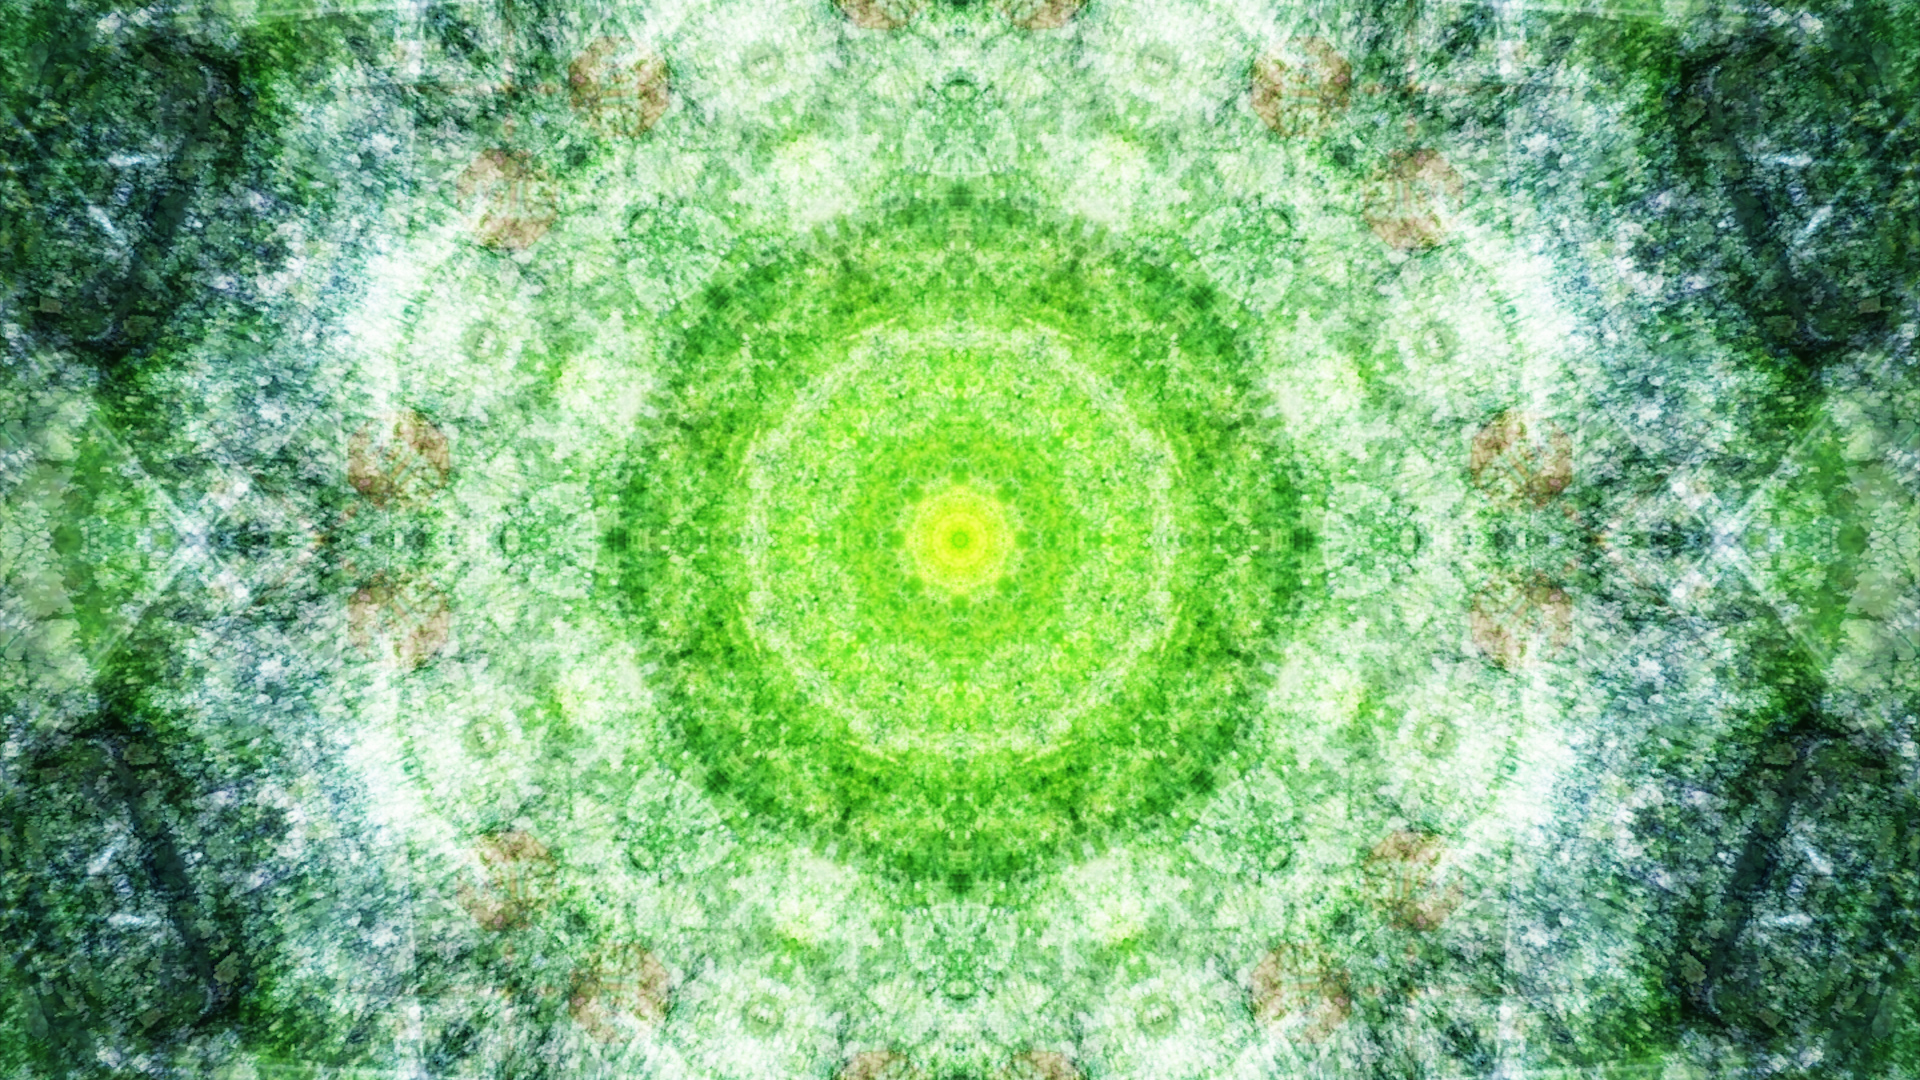 Emitting Velocity - Mohican Forest by Matt Swift Still 18